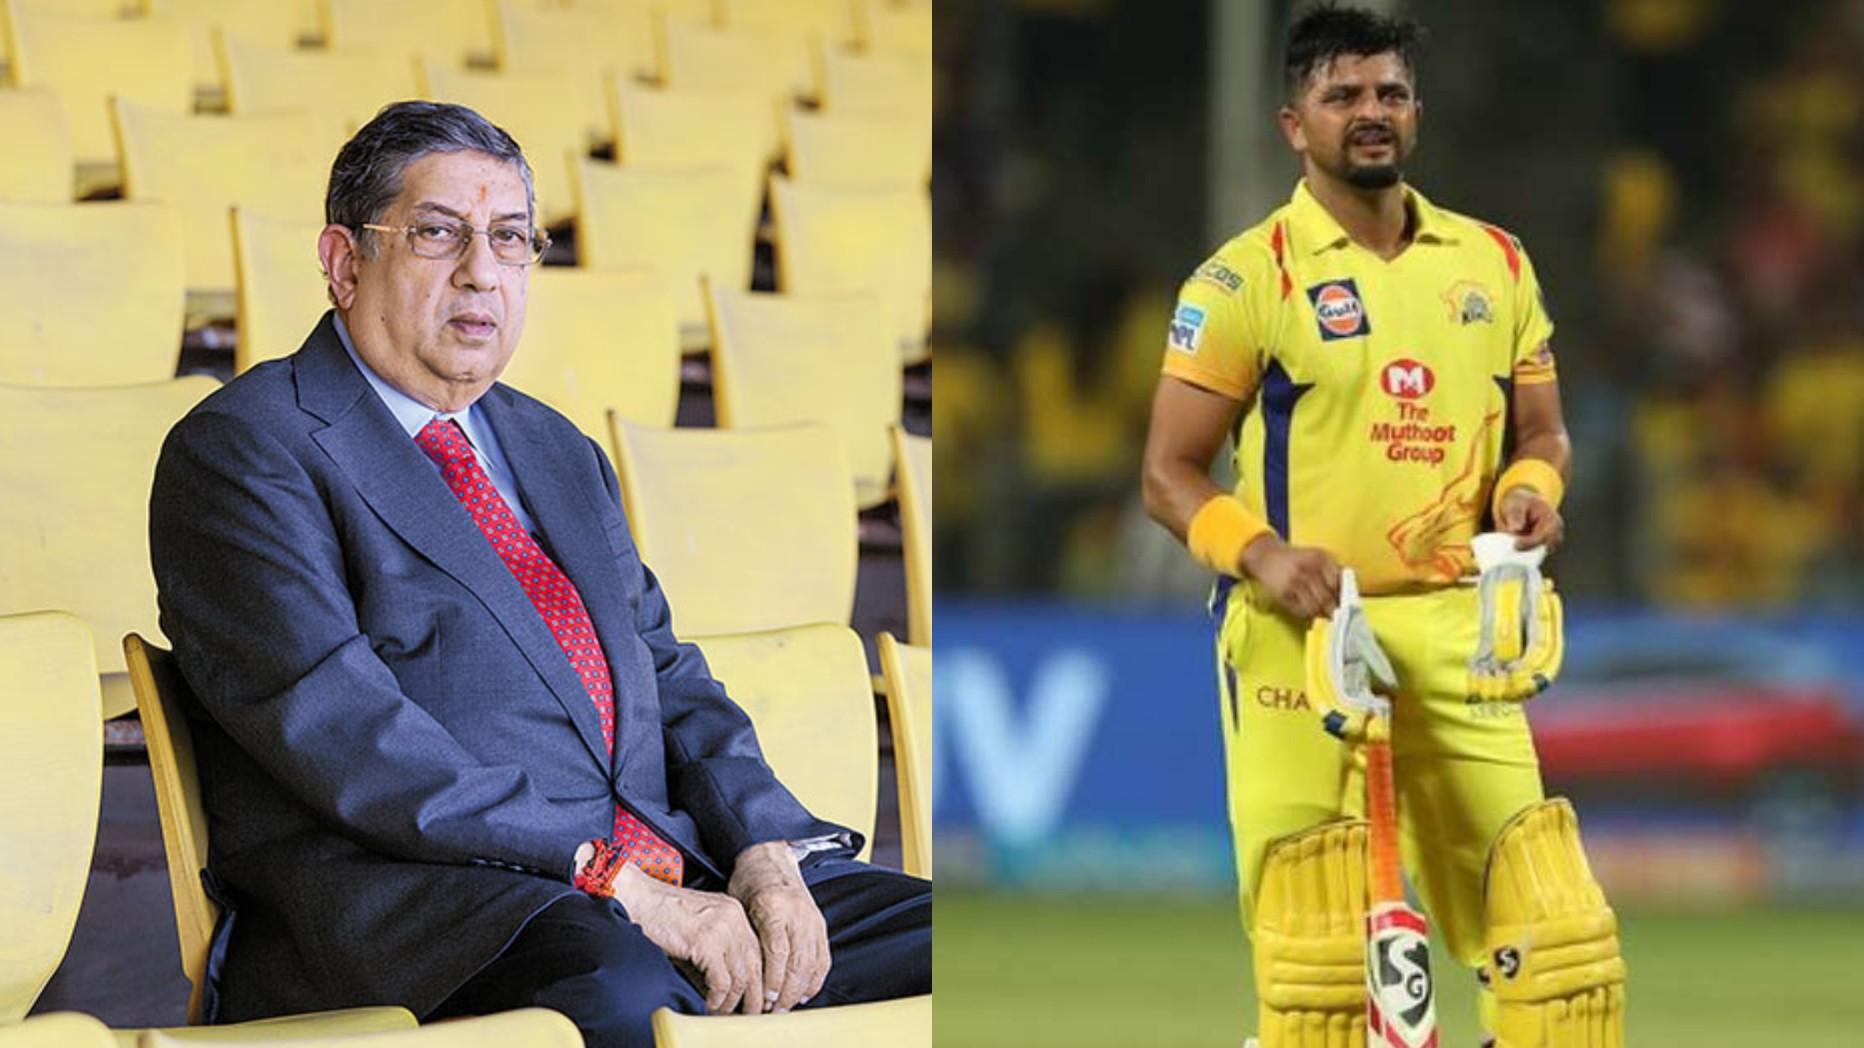 IPL 2020: CSK owner N Srinivasan calls Suresh Raina 'prima donna'; suggests success has gone into his head